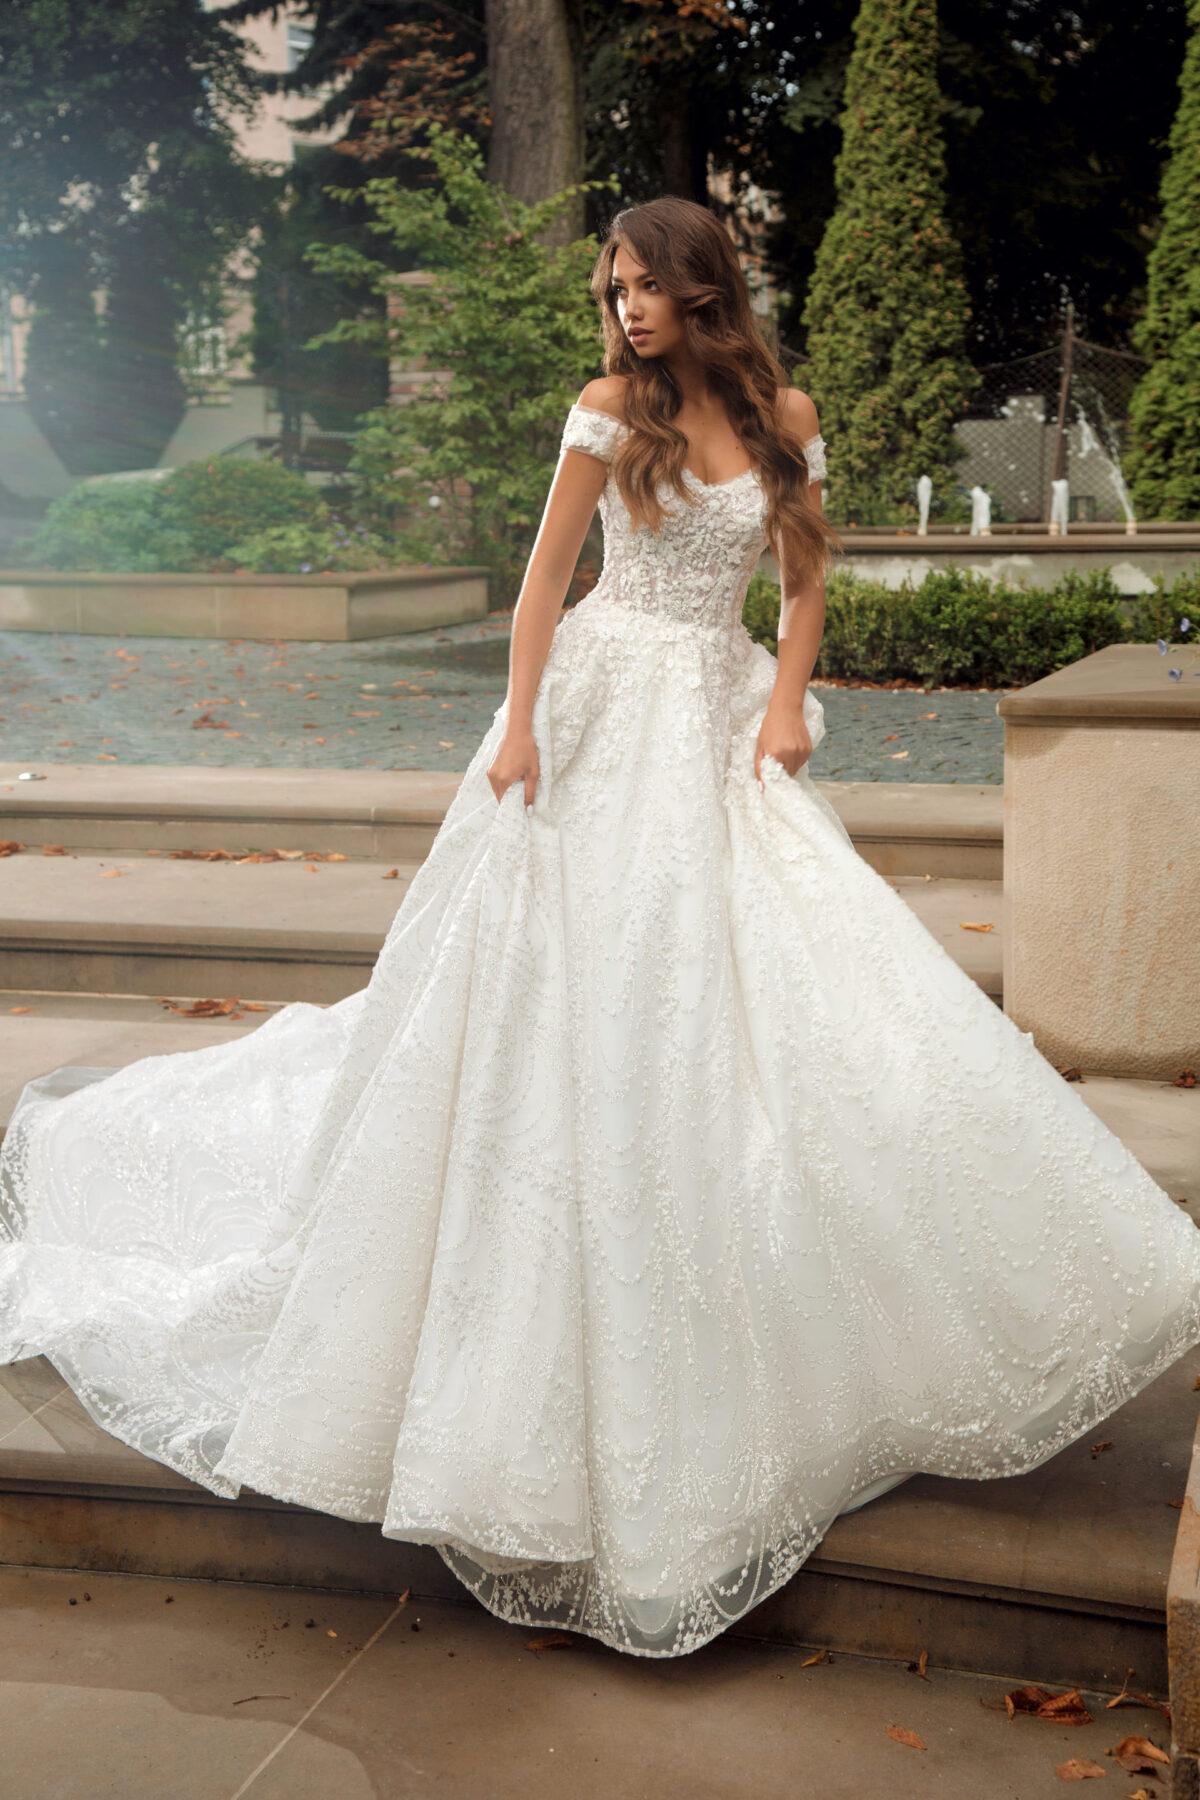 Ukrainian wedding dresses